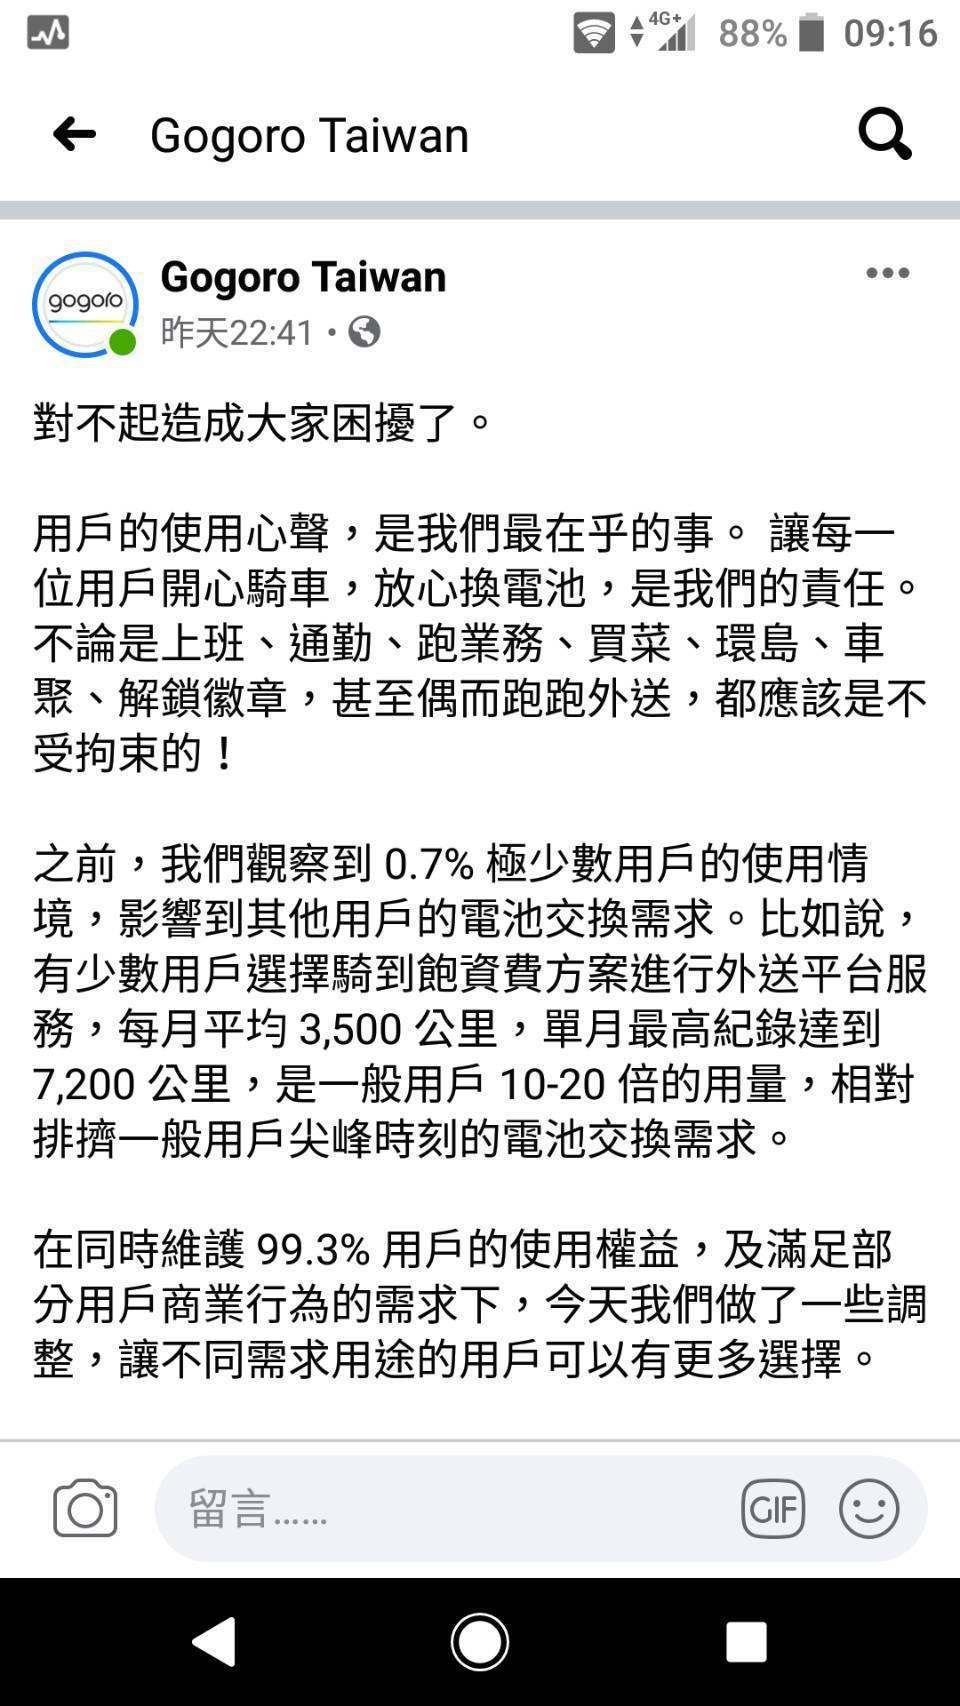 Gogoro Network昨天晚上臉書上說明專案,請大家放心騎、免擔心。記者/...